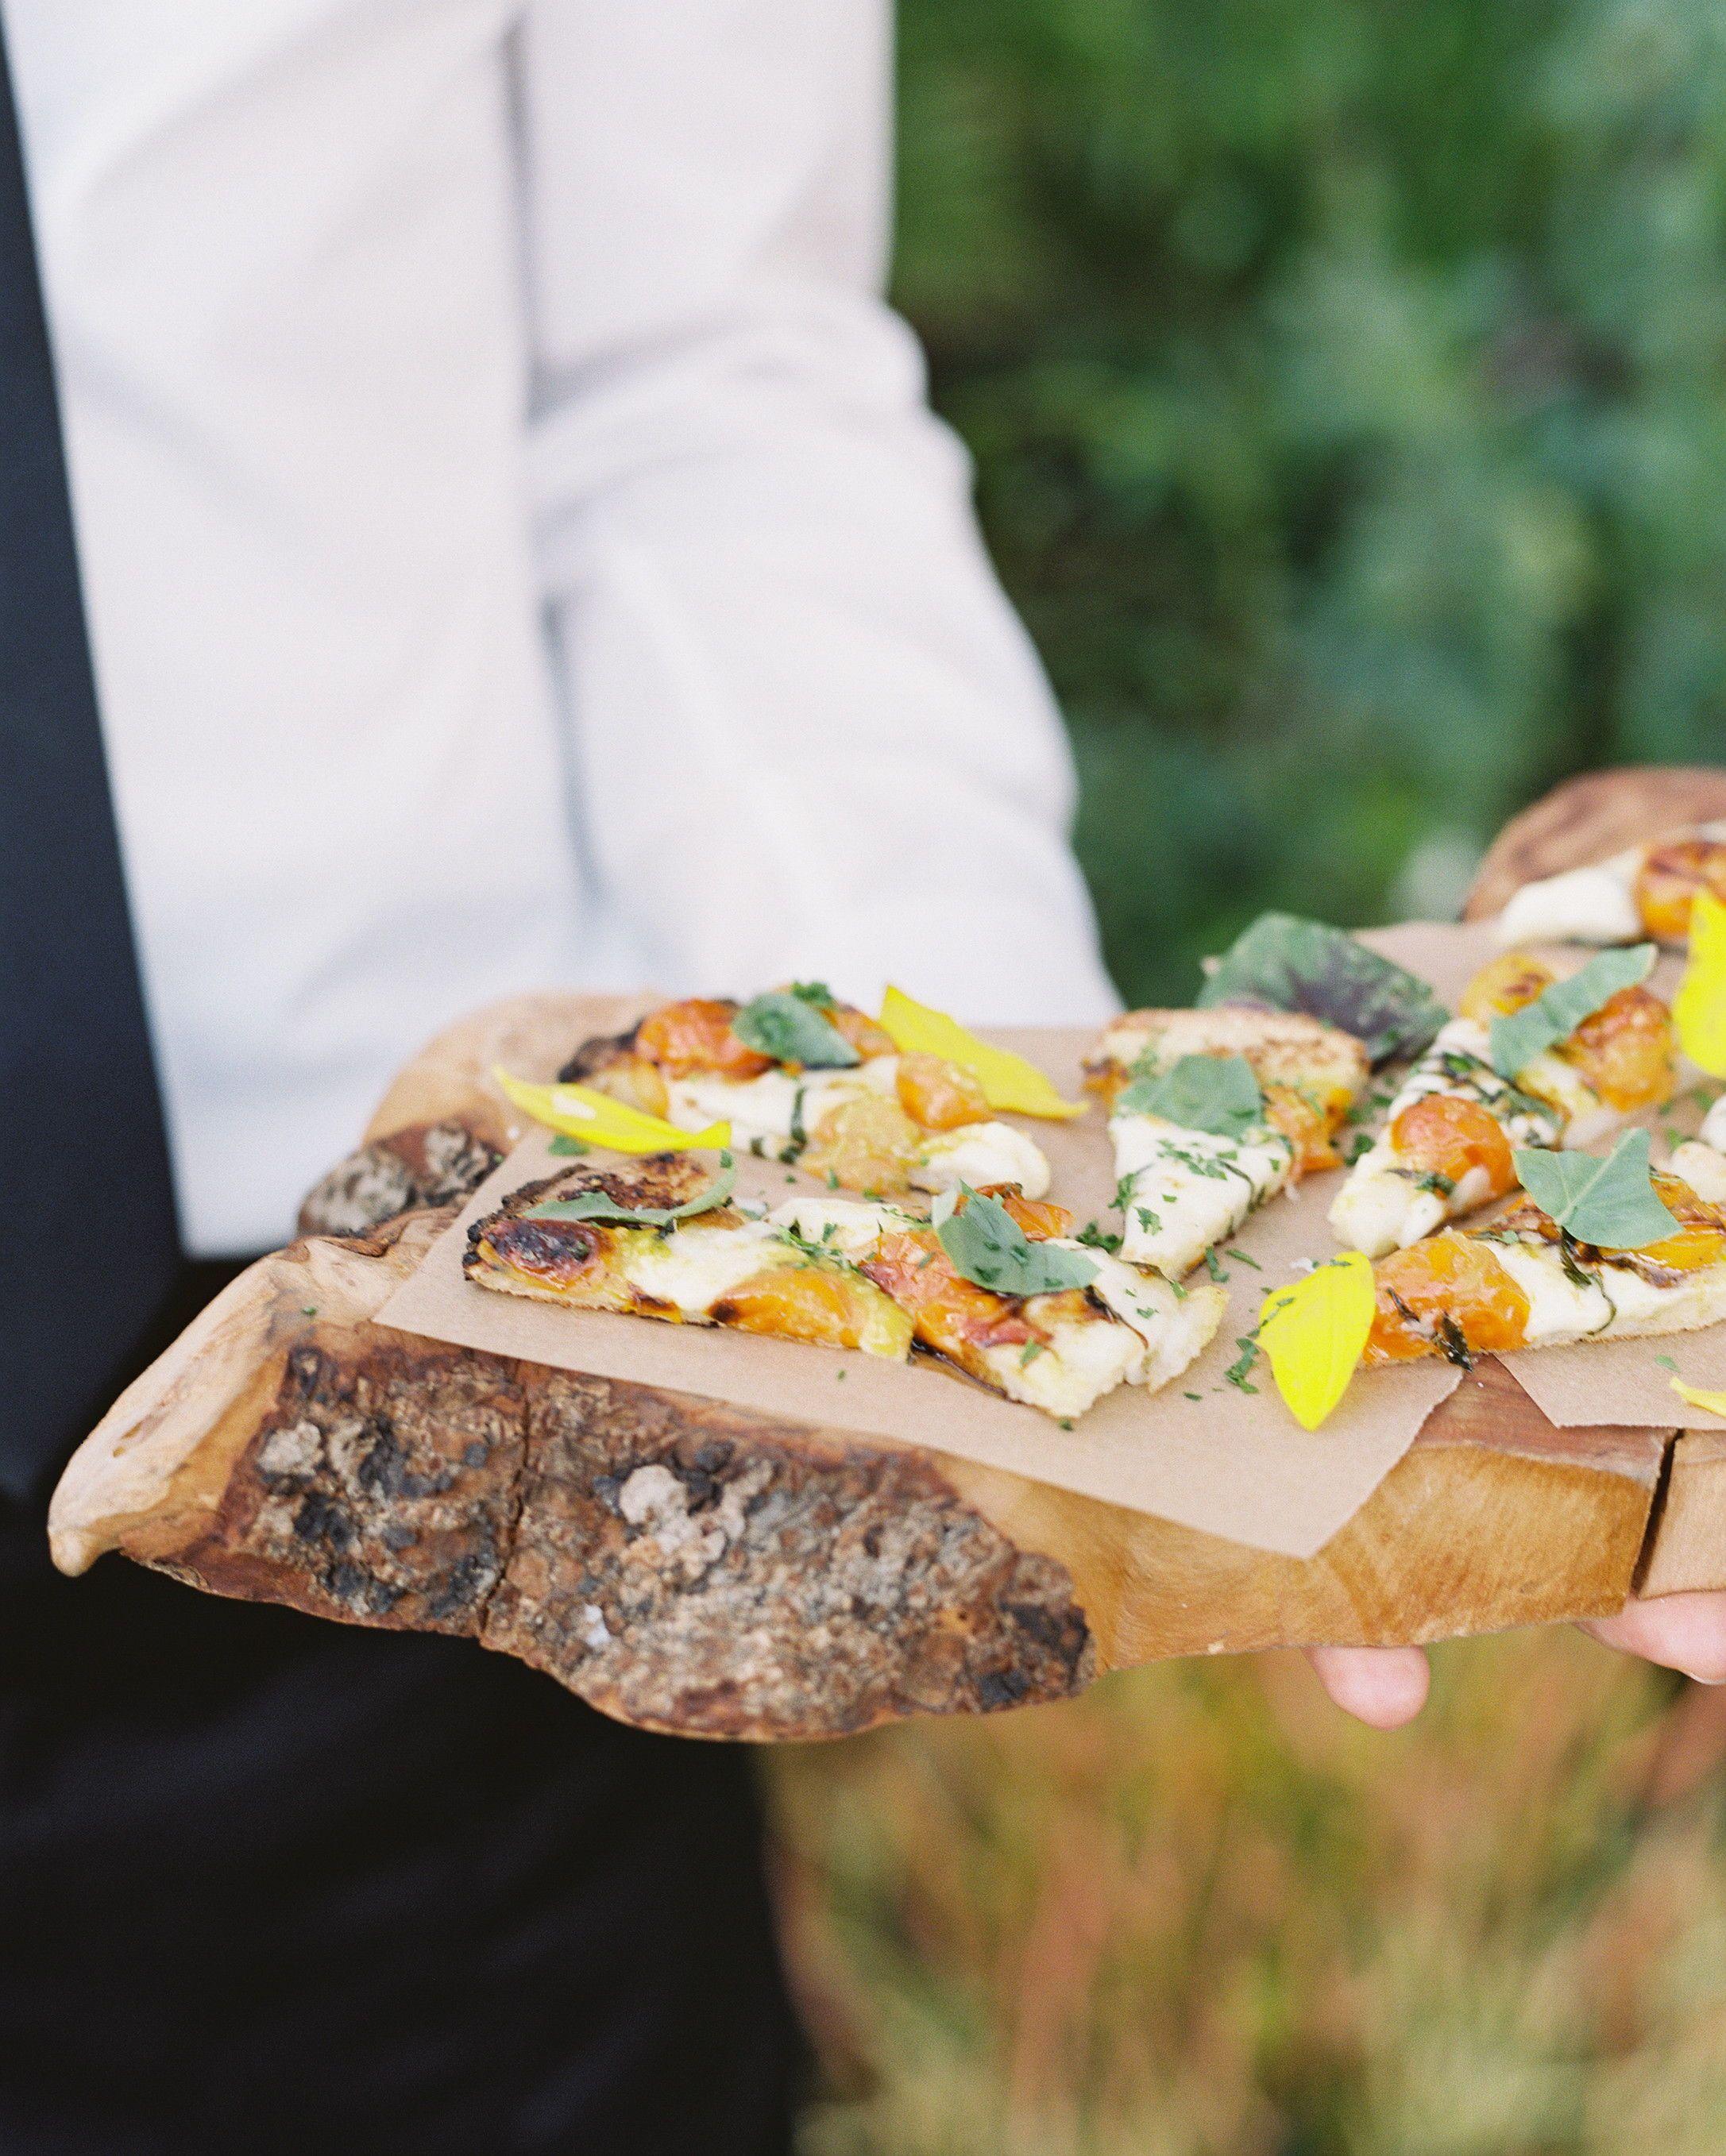 Pizza Wedding Reception Ideas: 26 Delicious Wedding Ideas For Couples Crazy About Pizza